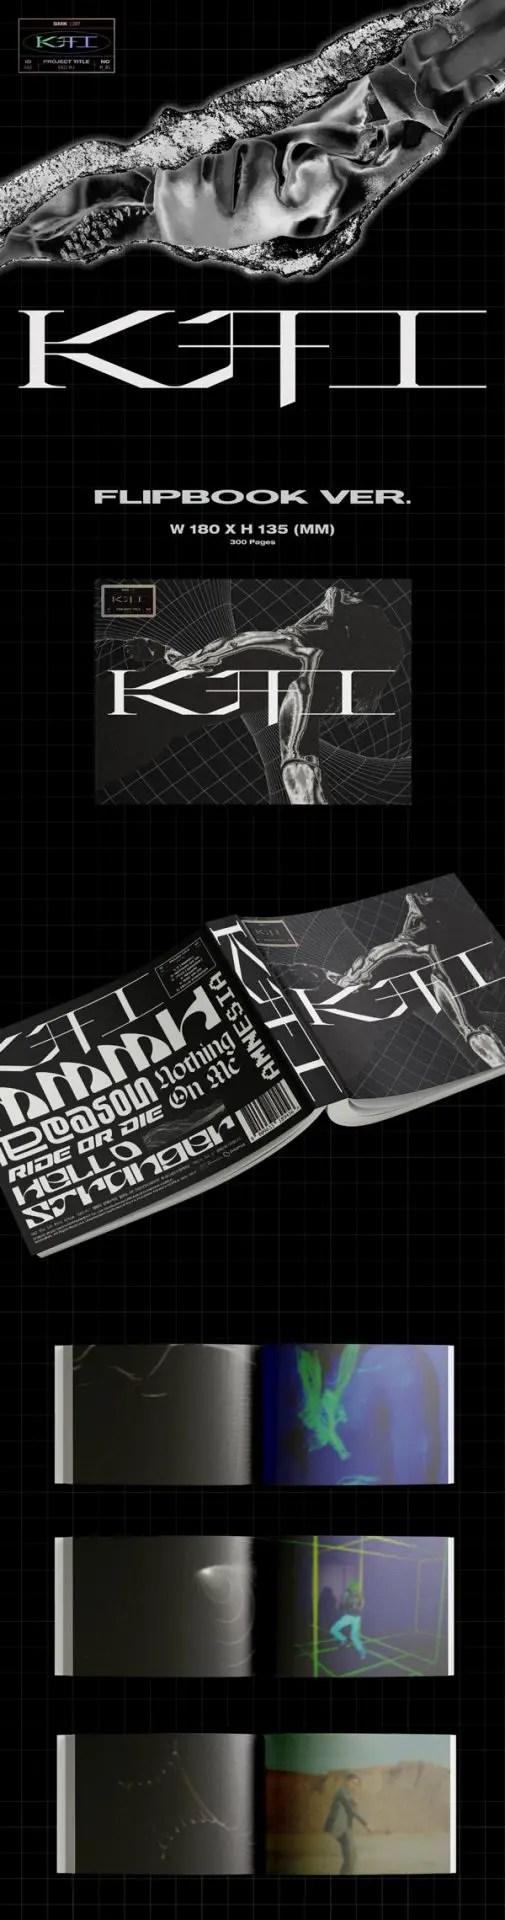 KAI 카이 The 1st Mini Album [KAI (开)] - Flip Book Version - Details #1